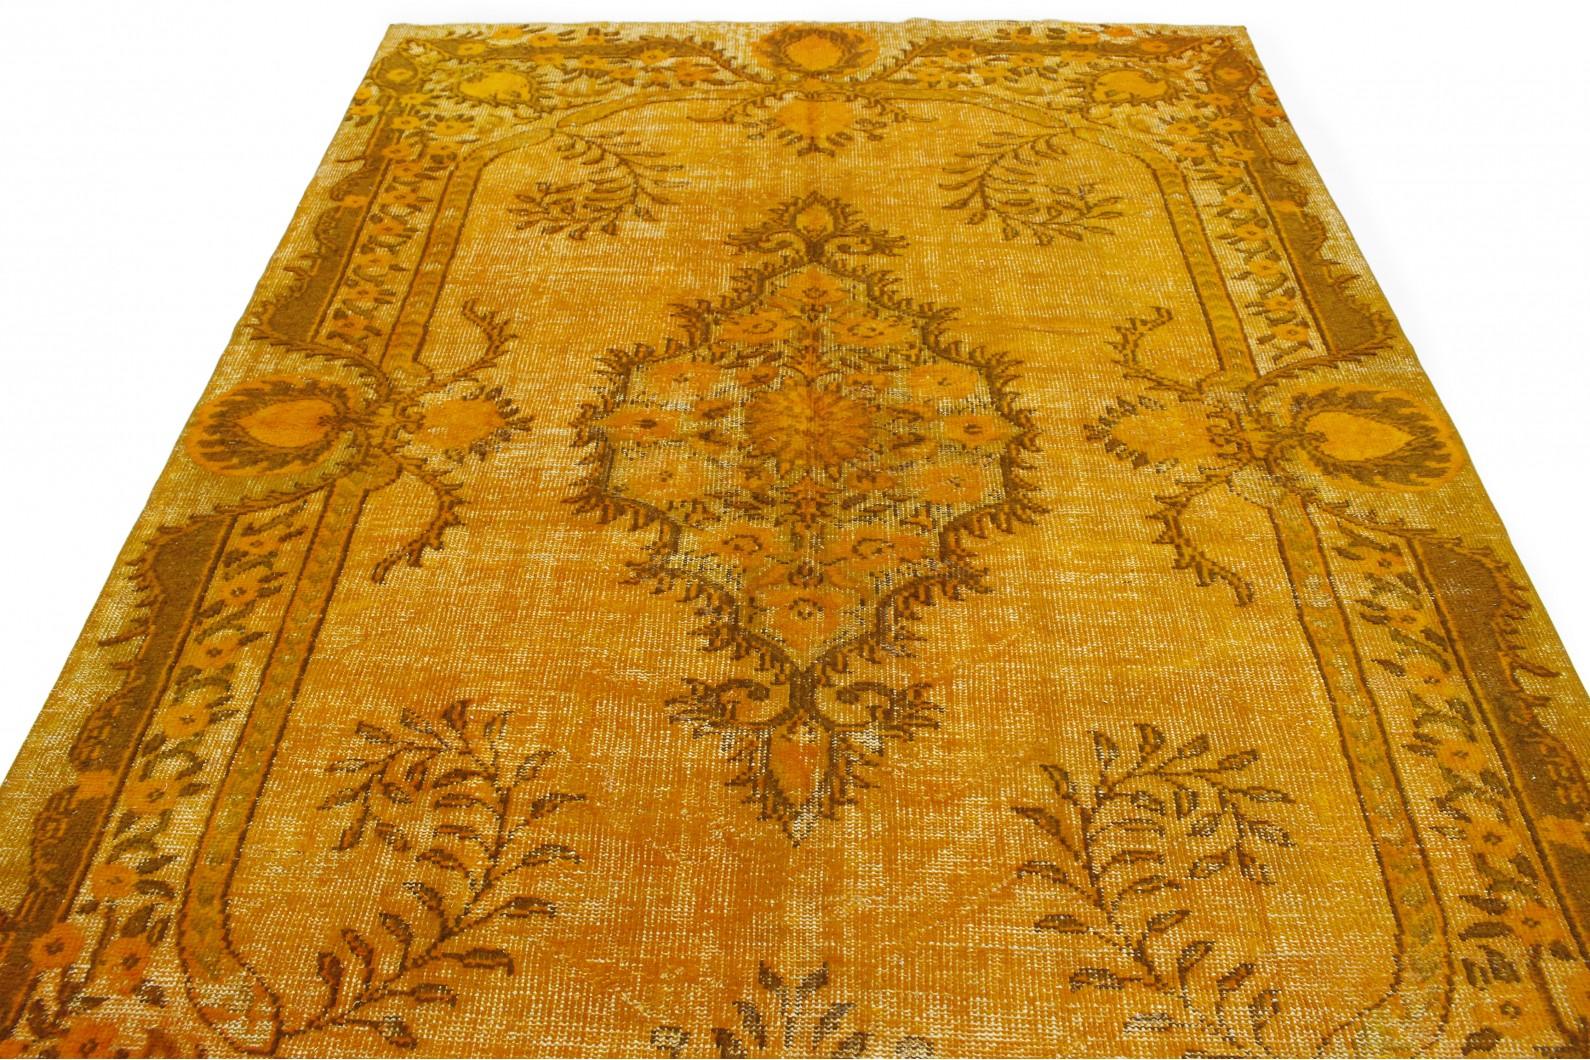 vintage teppich 3d look orange in 300x210 1011 6018 bei. Black Bedroom Furniture Sets. Home Design Ideas